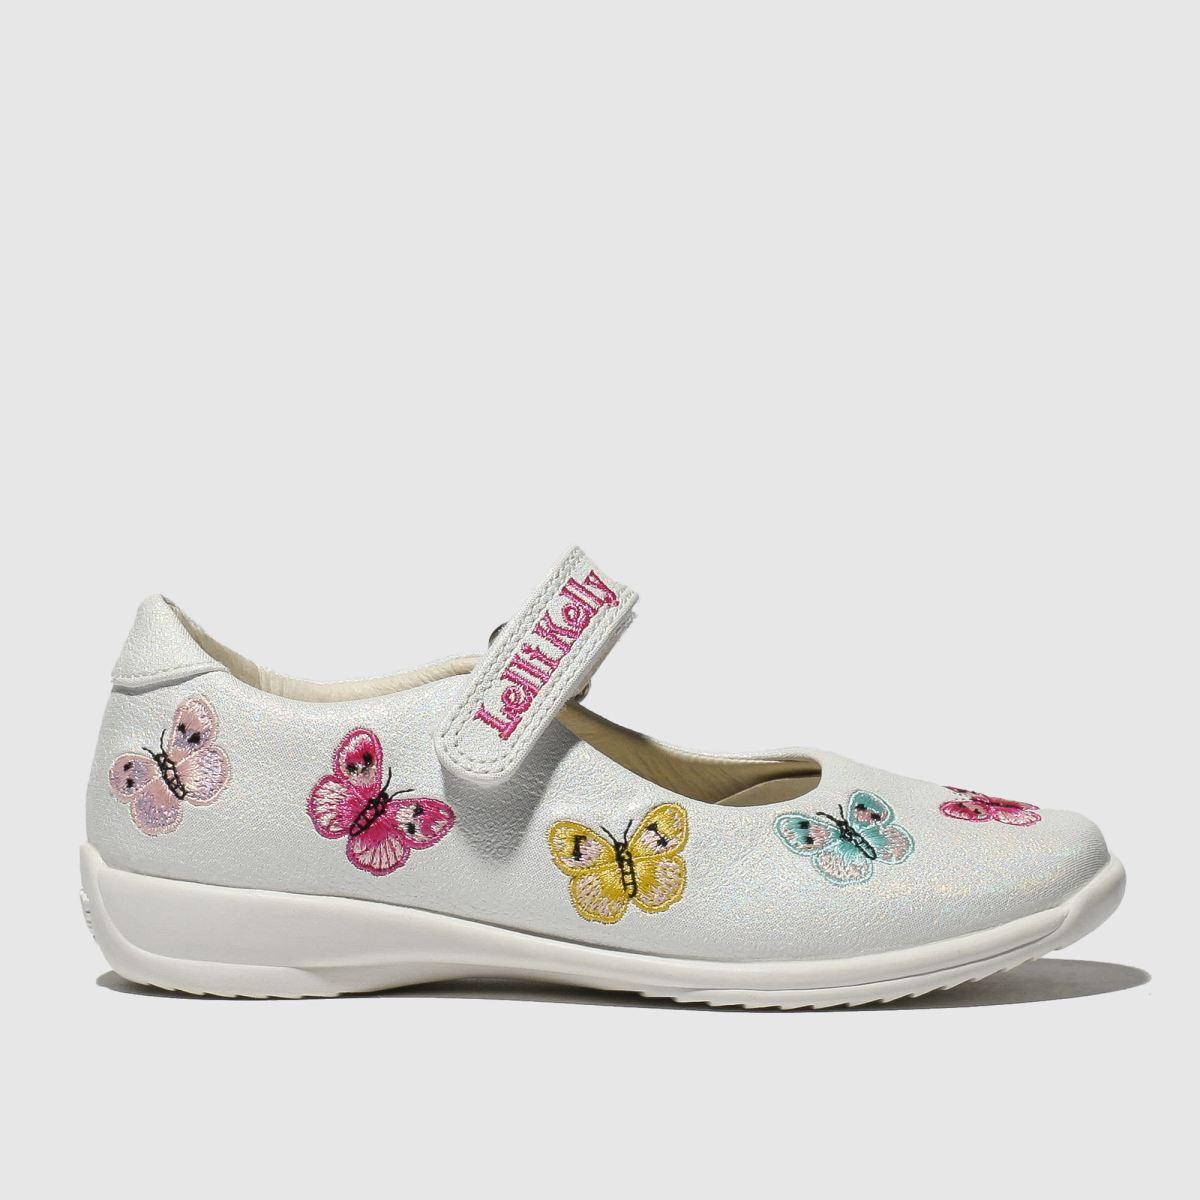 Lelli Kelly White Princess Katheryne Shoes Junior